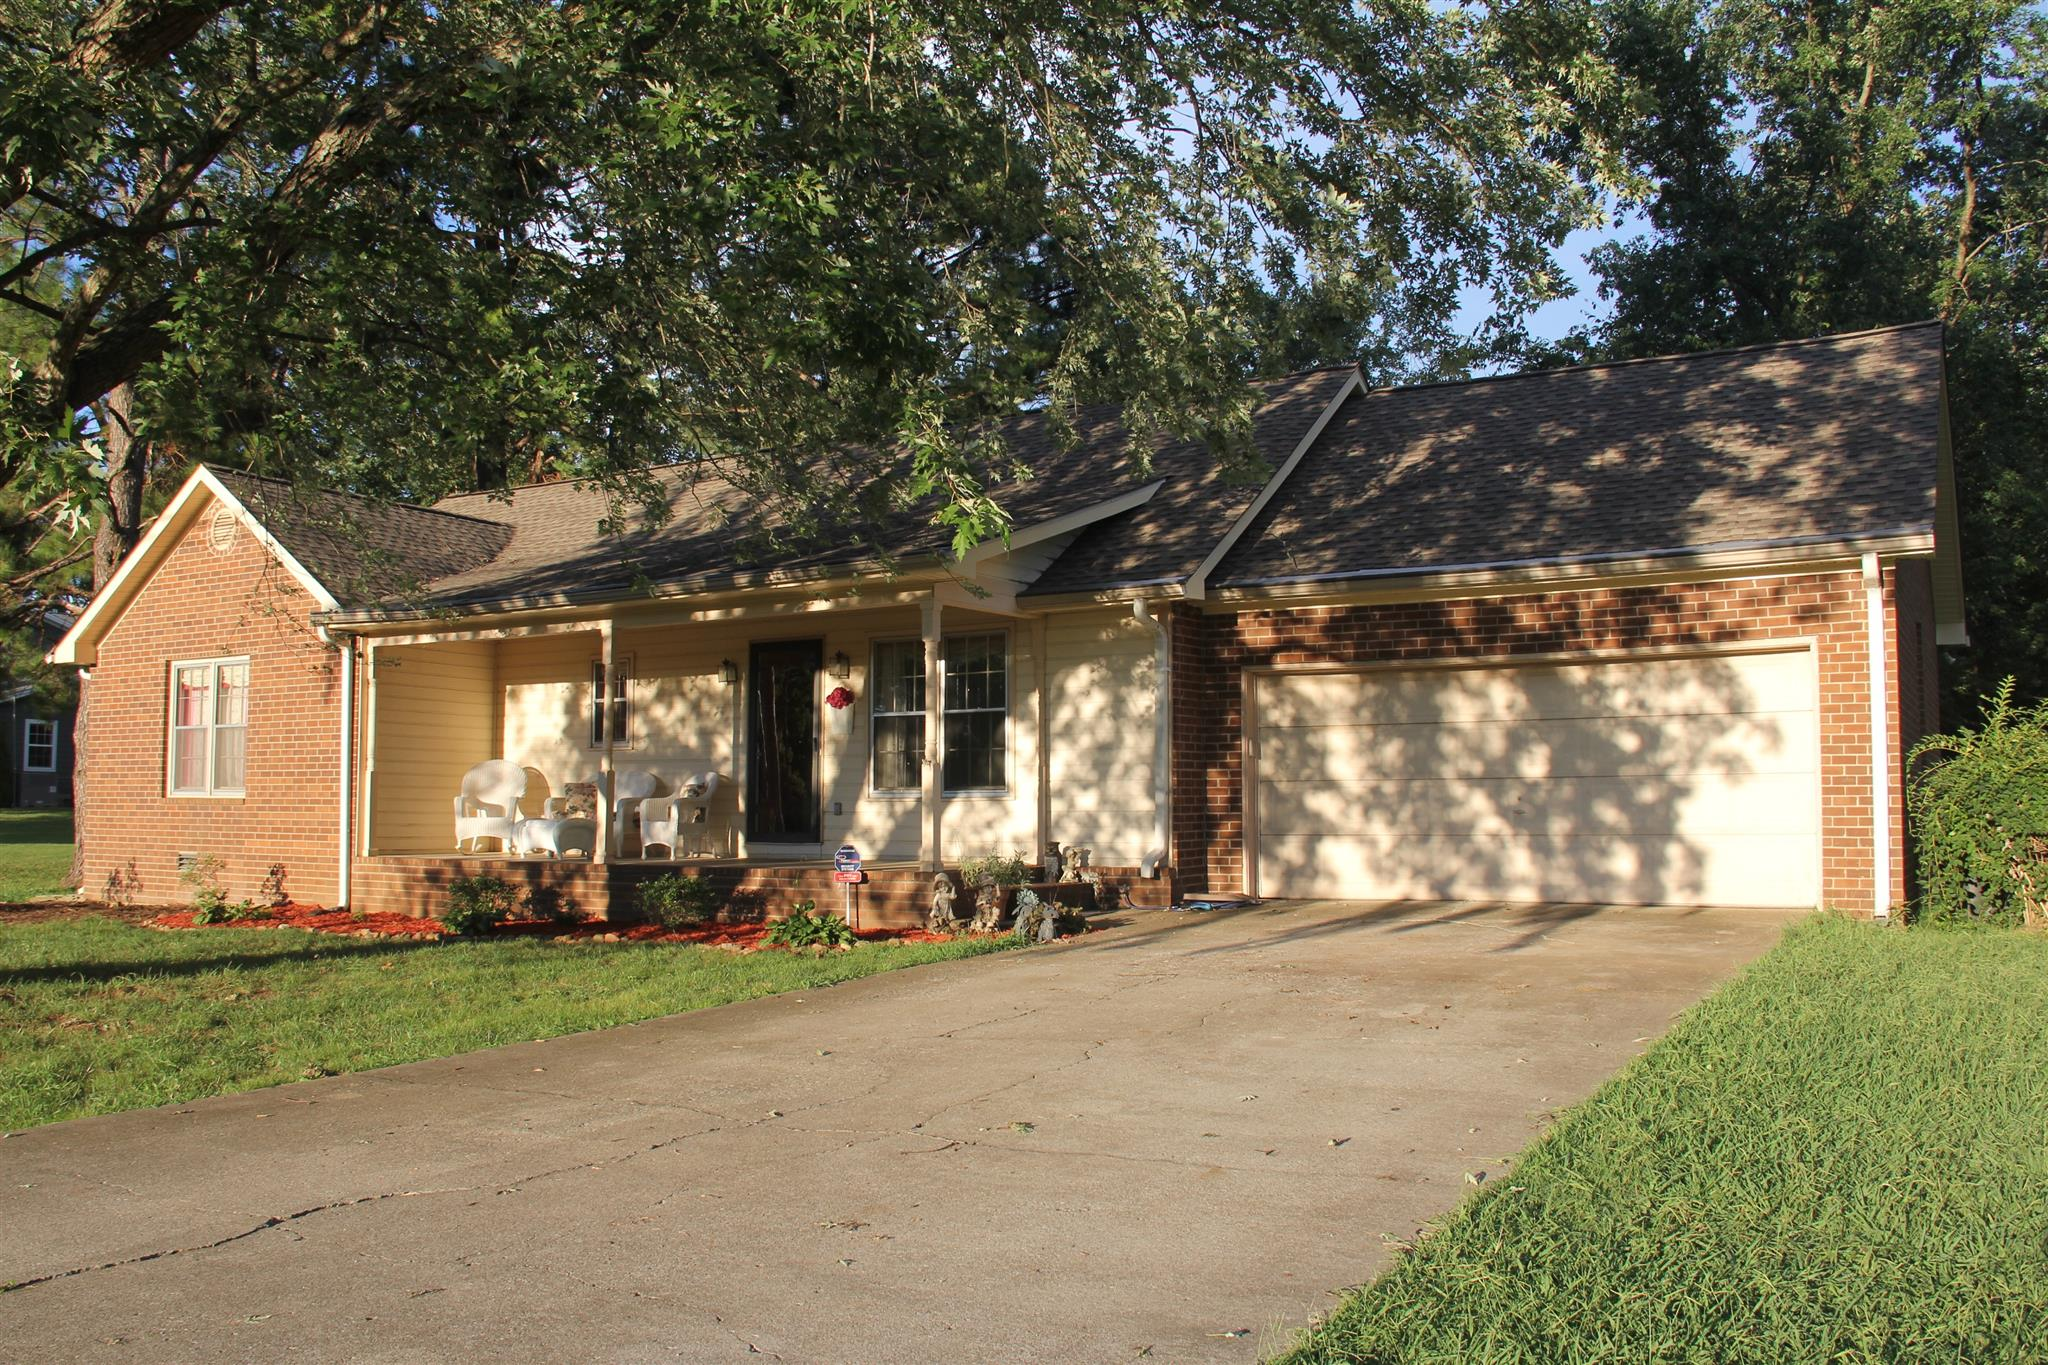 1103 Cason Ln, Murfreesboro, TN 37128